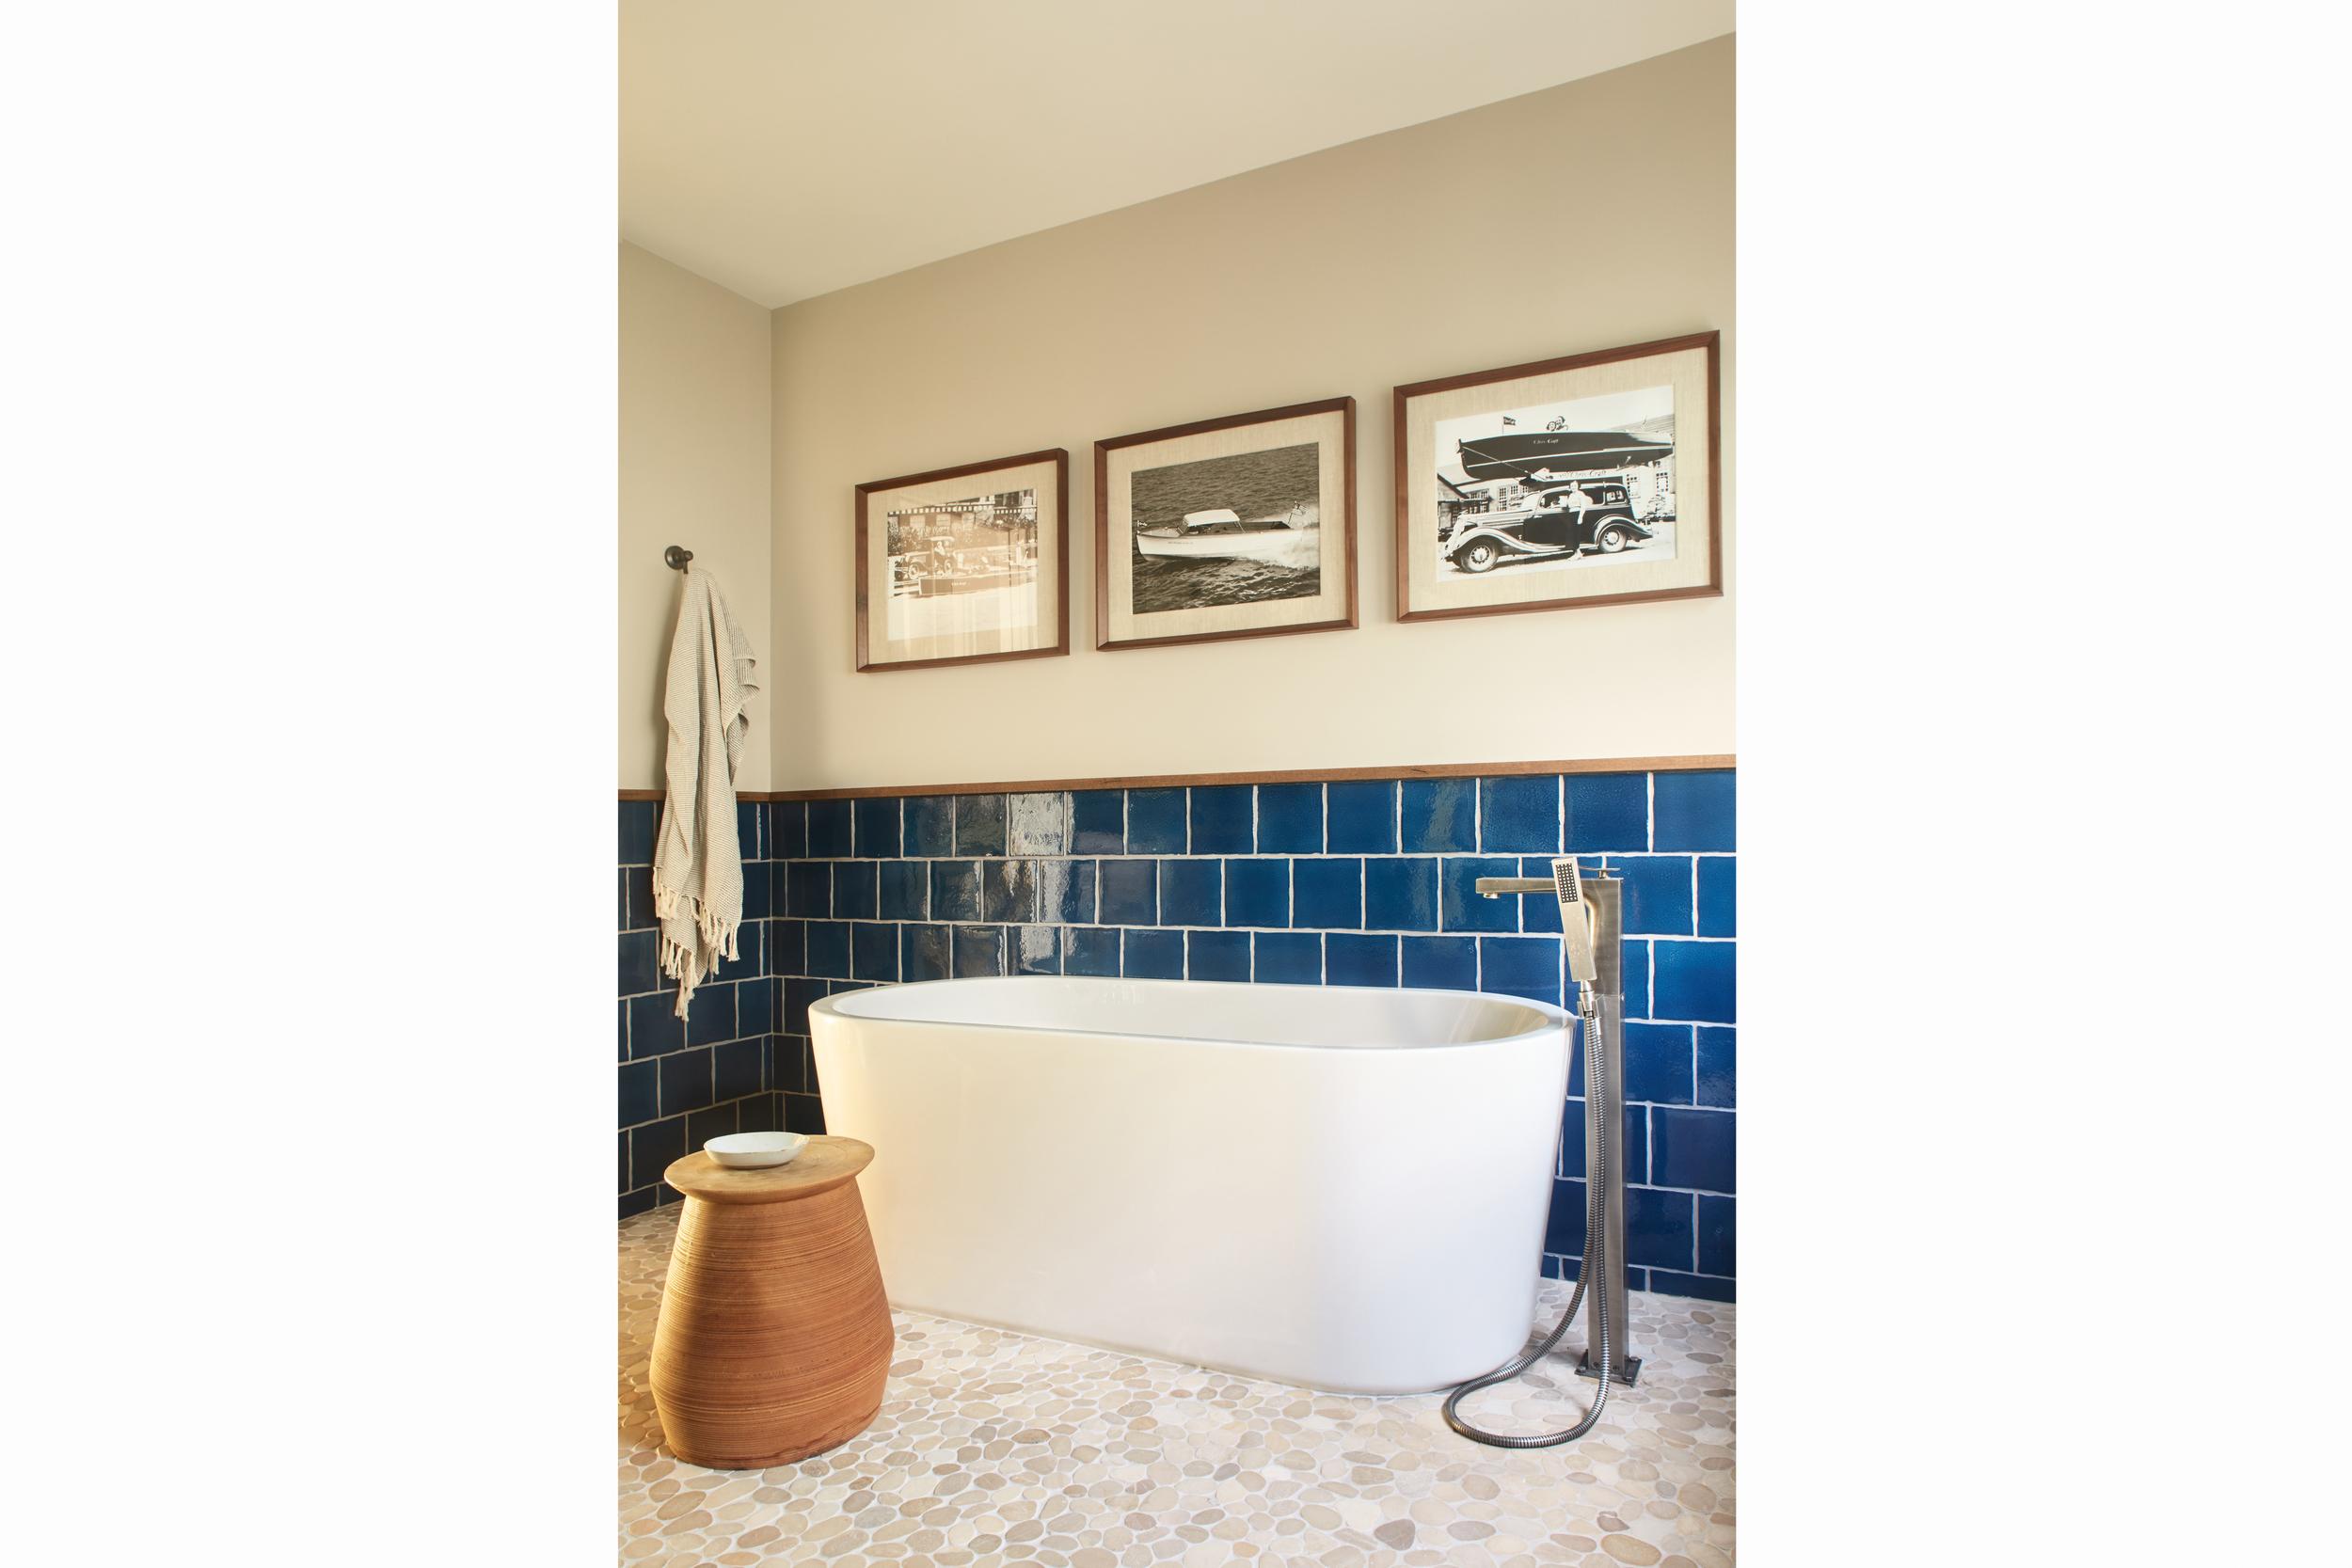 newport beach interior designer brittany stiles blue nautical master bathroom blue tile modern tub.jpg